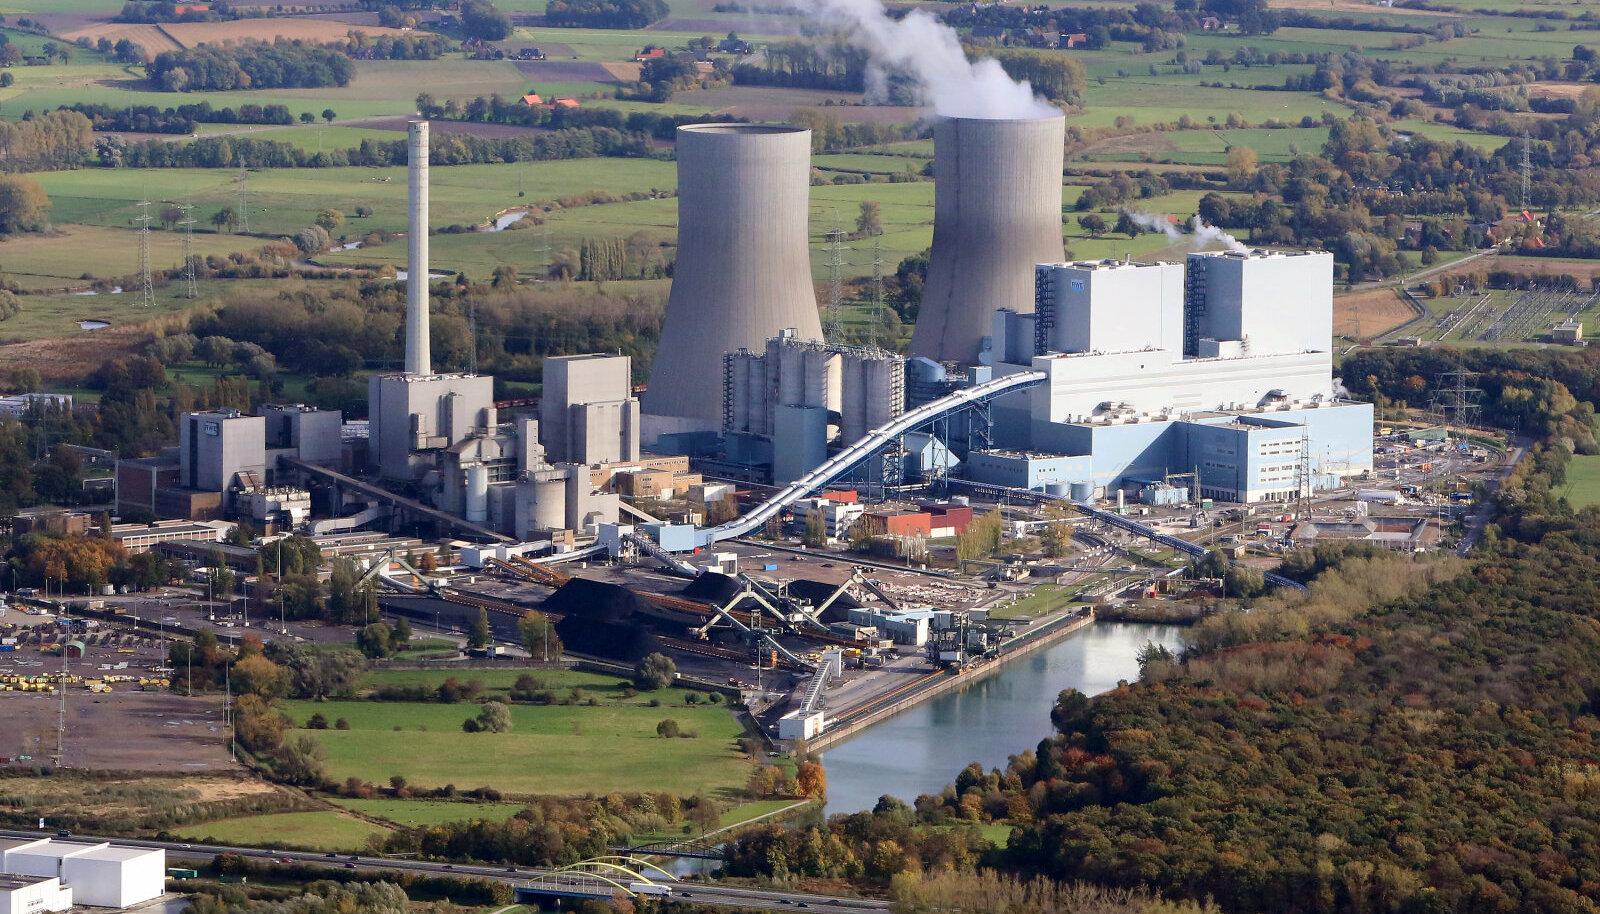 RWE Kraftwerk Westfalen. Foto: Tim Reckmann